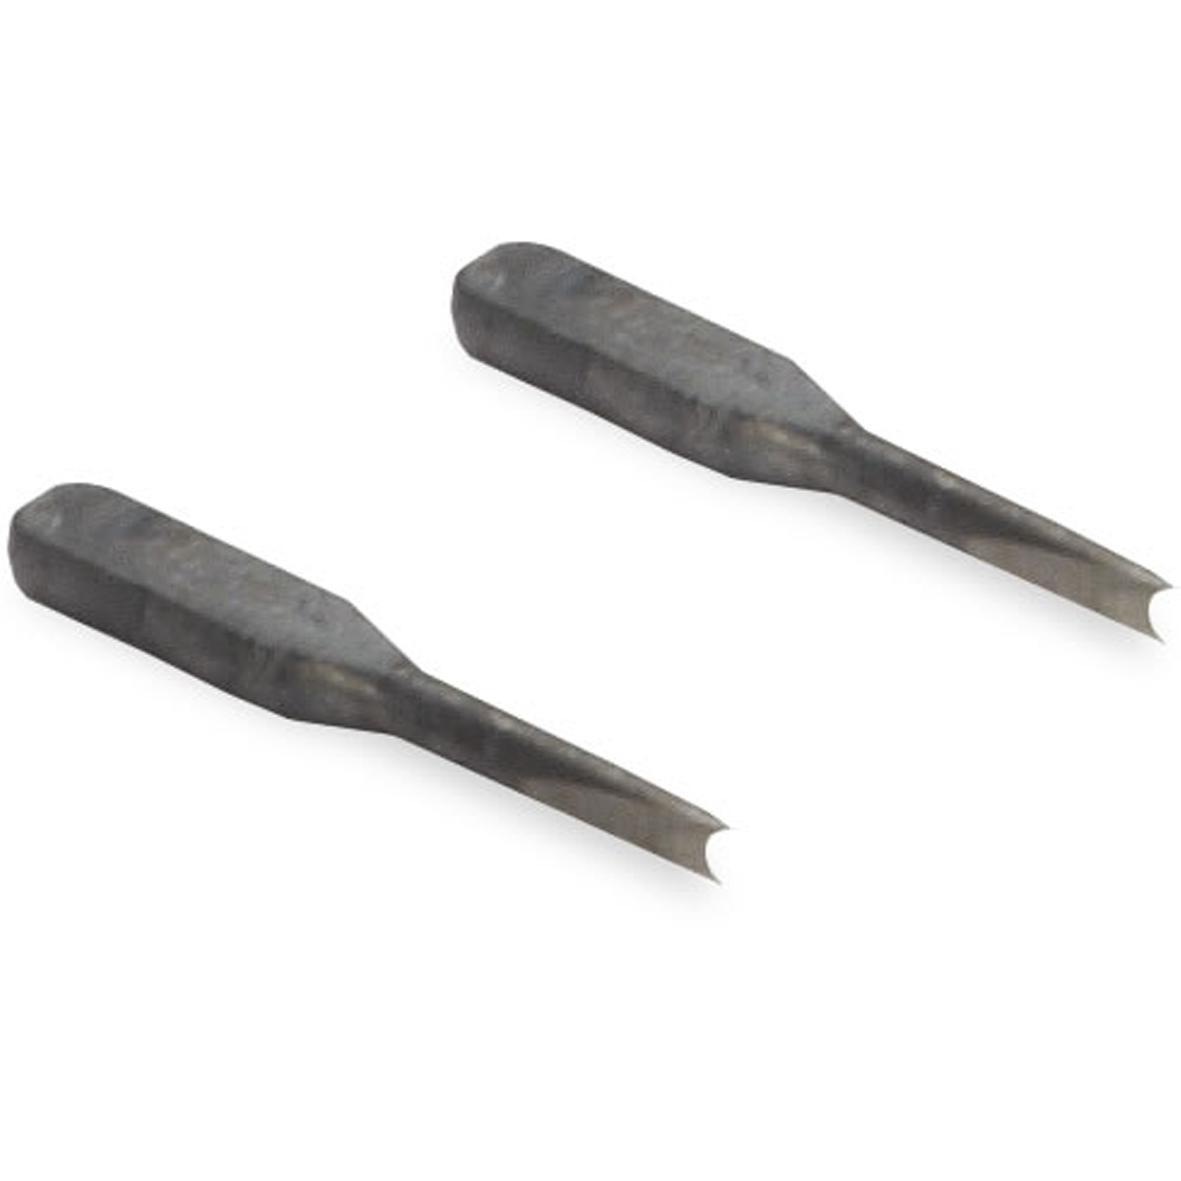 Bernina Rpacement CutWork Needles